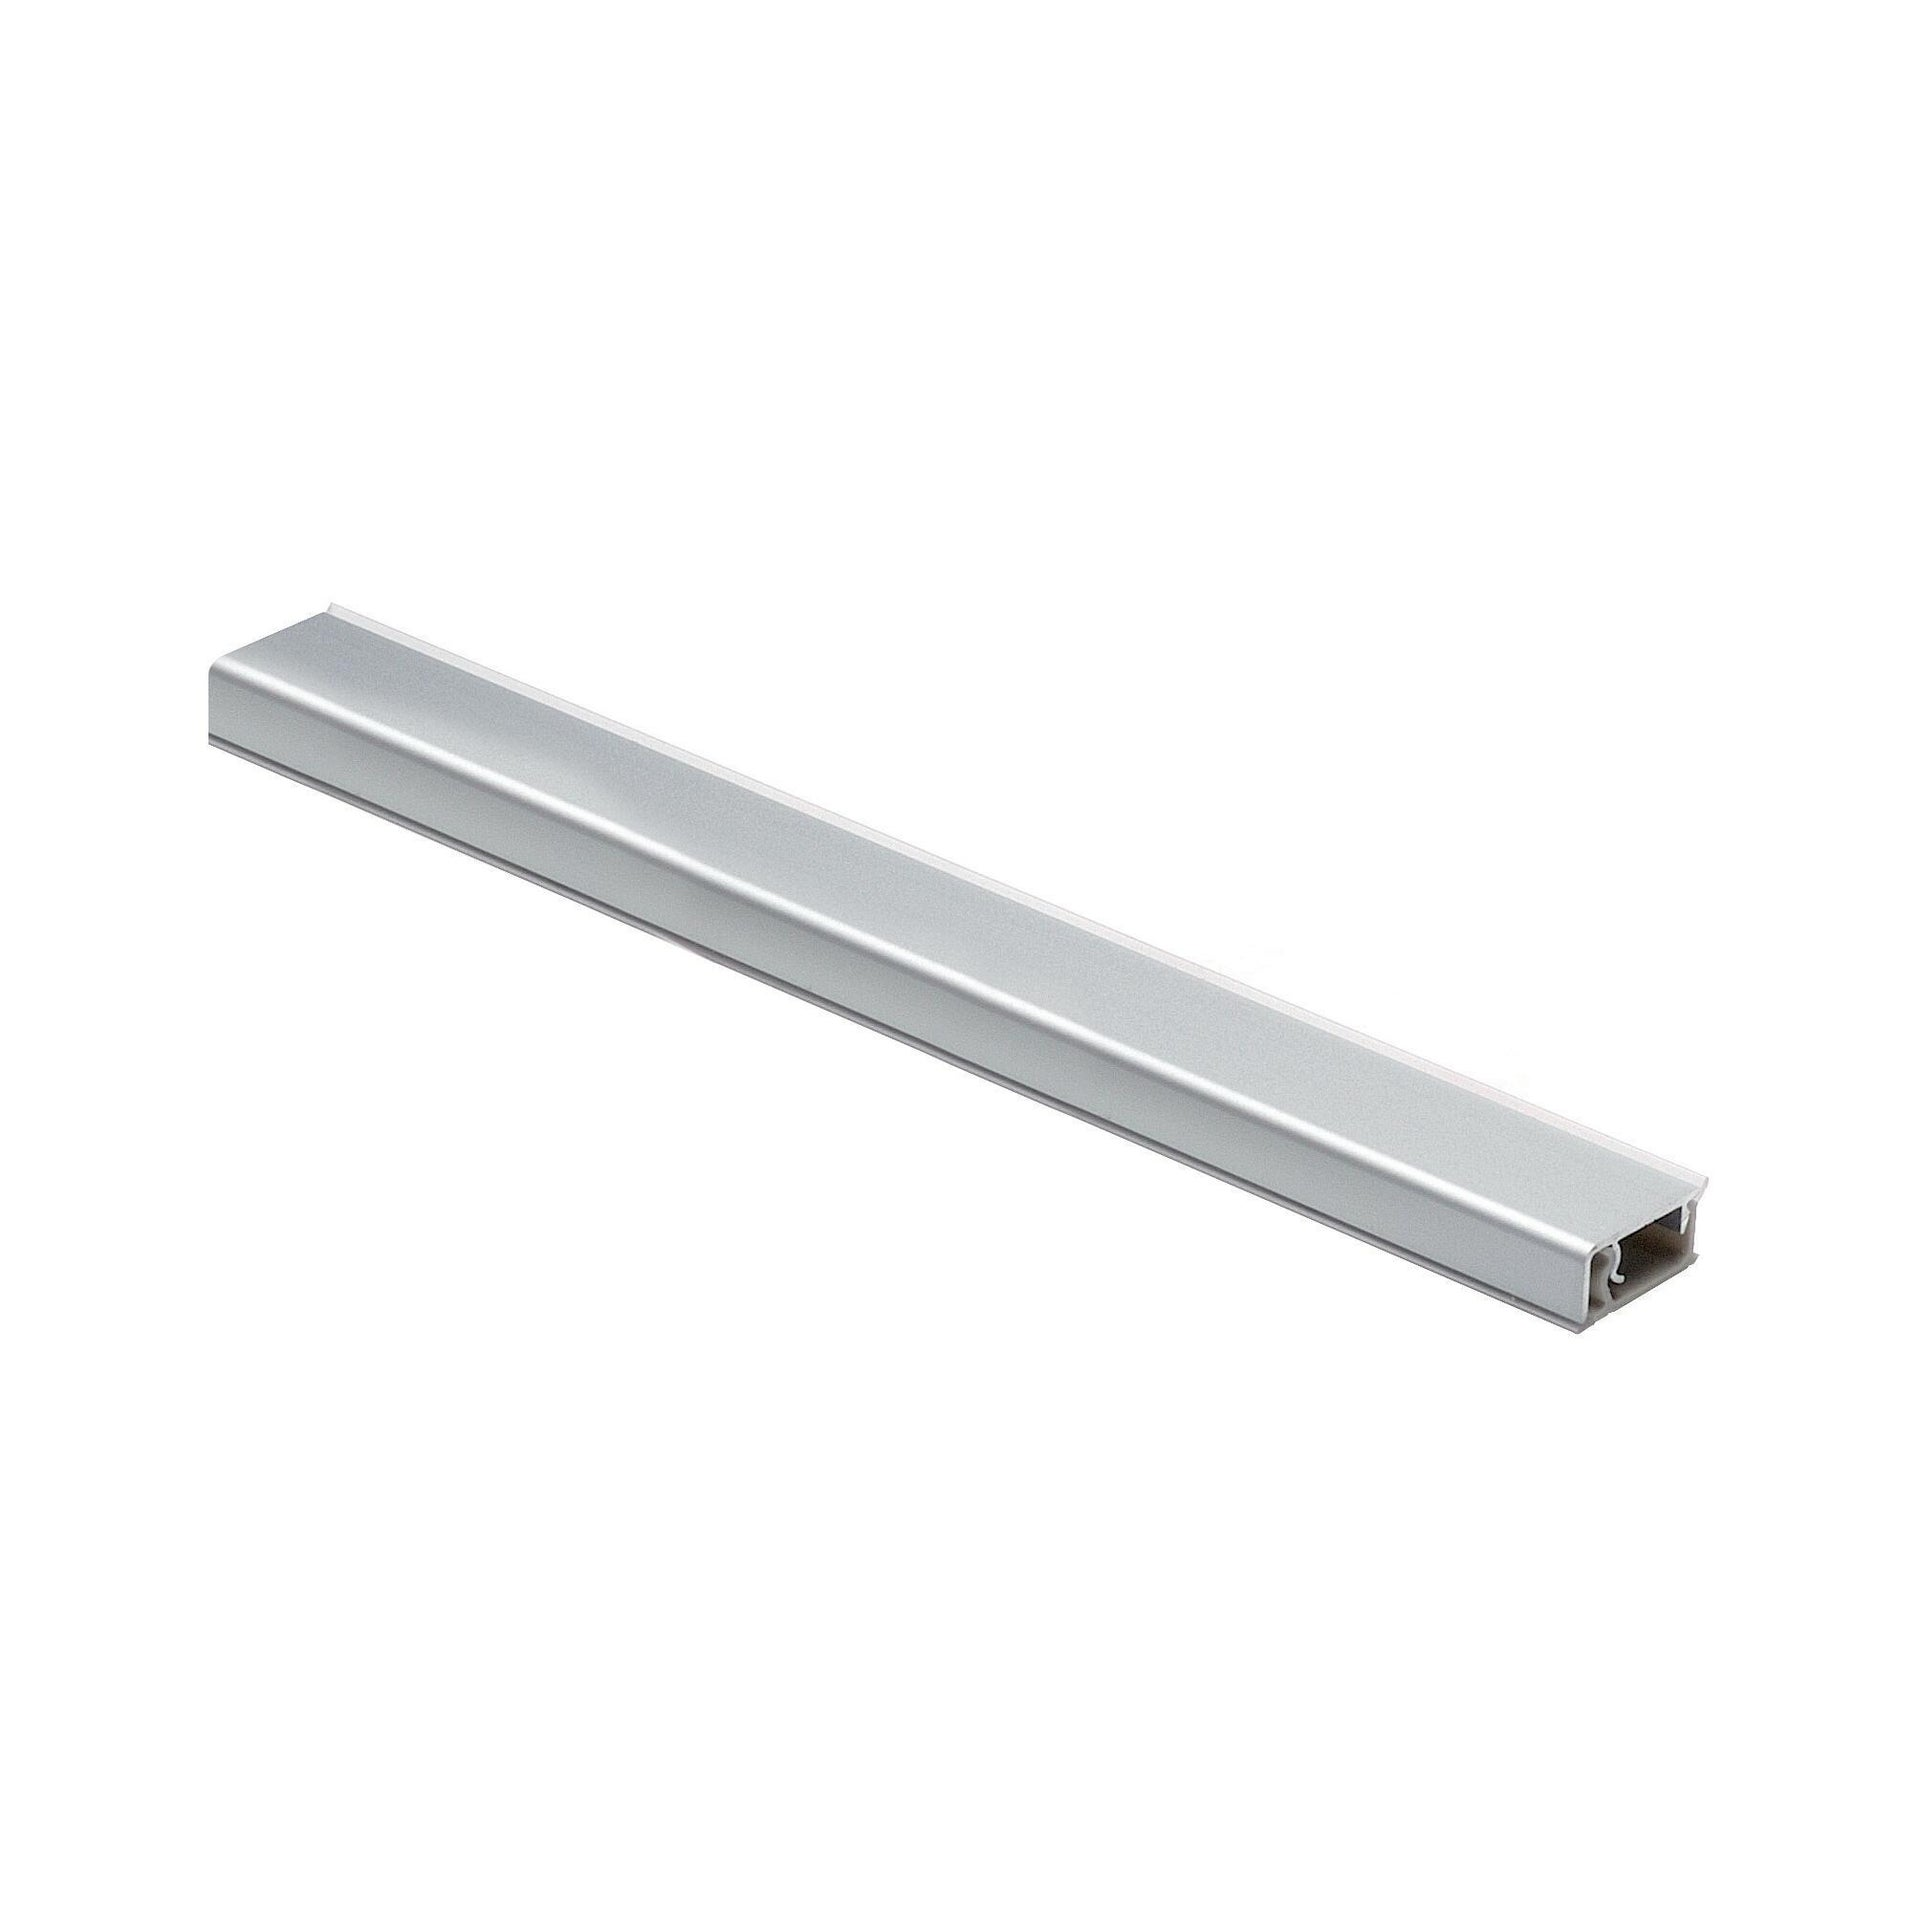 Alzatina alluminio grigio L 300 x Sp 1.2 cm